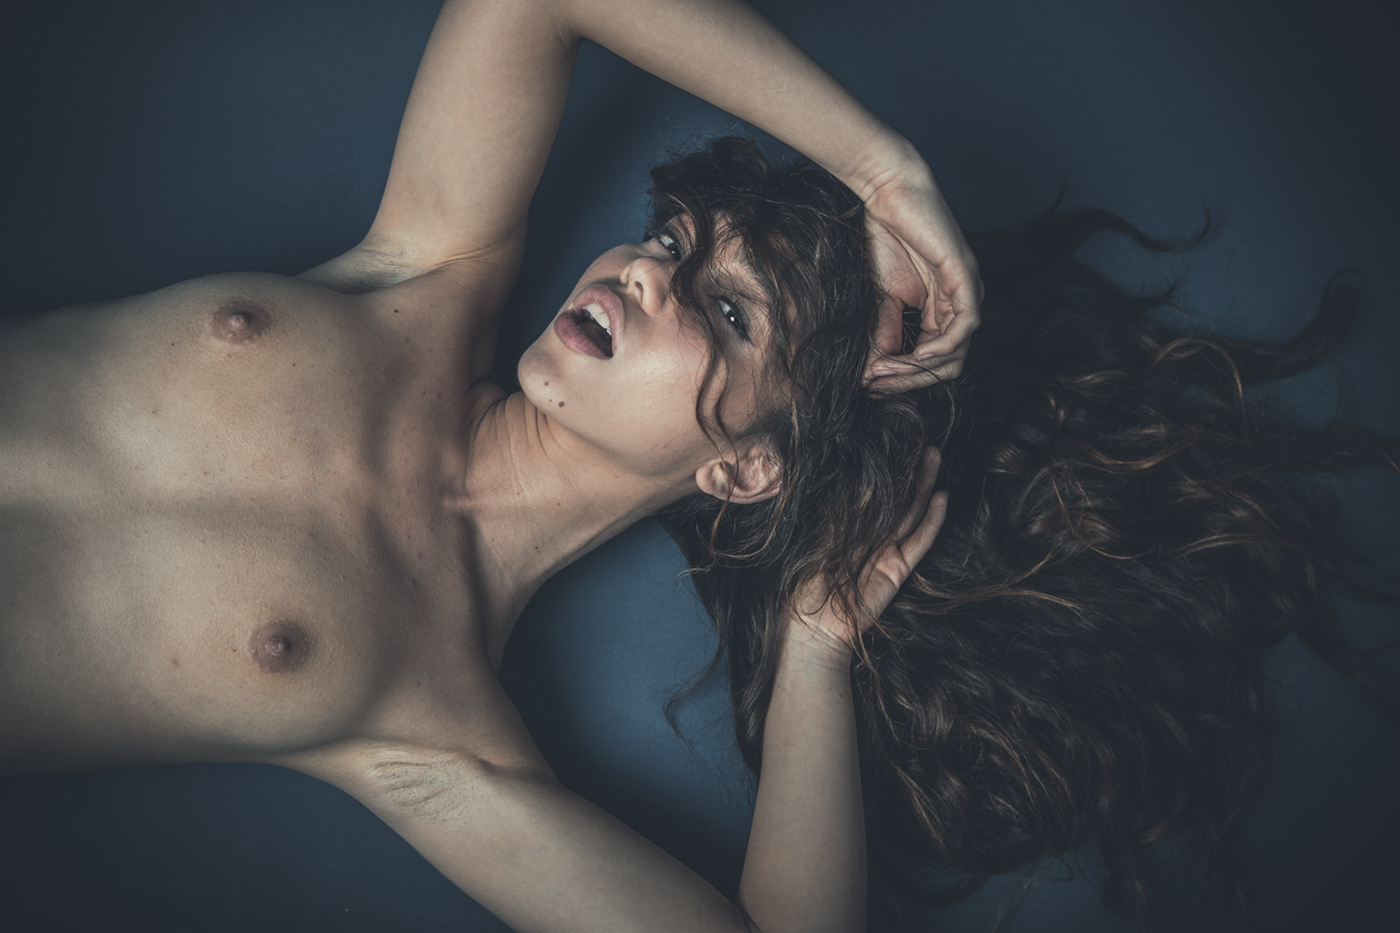 KitRysha / Stefano Girardi